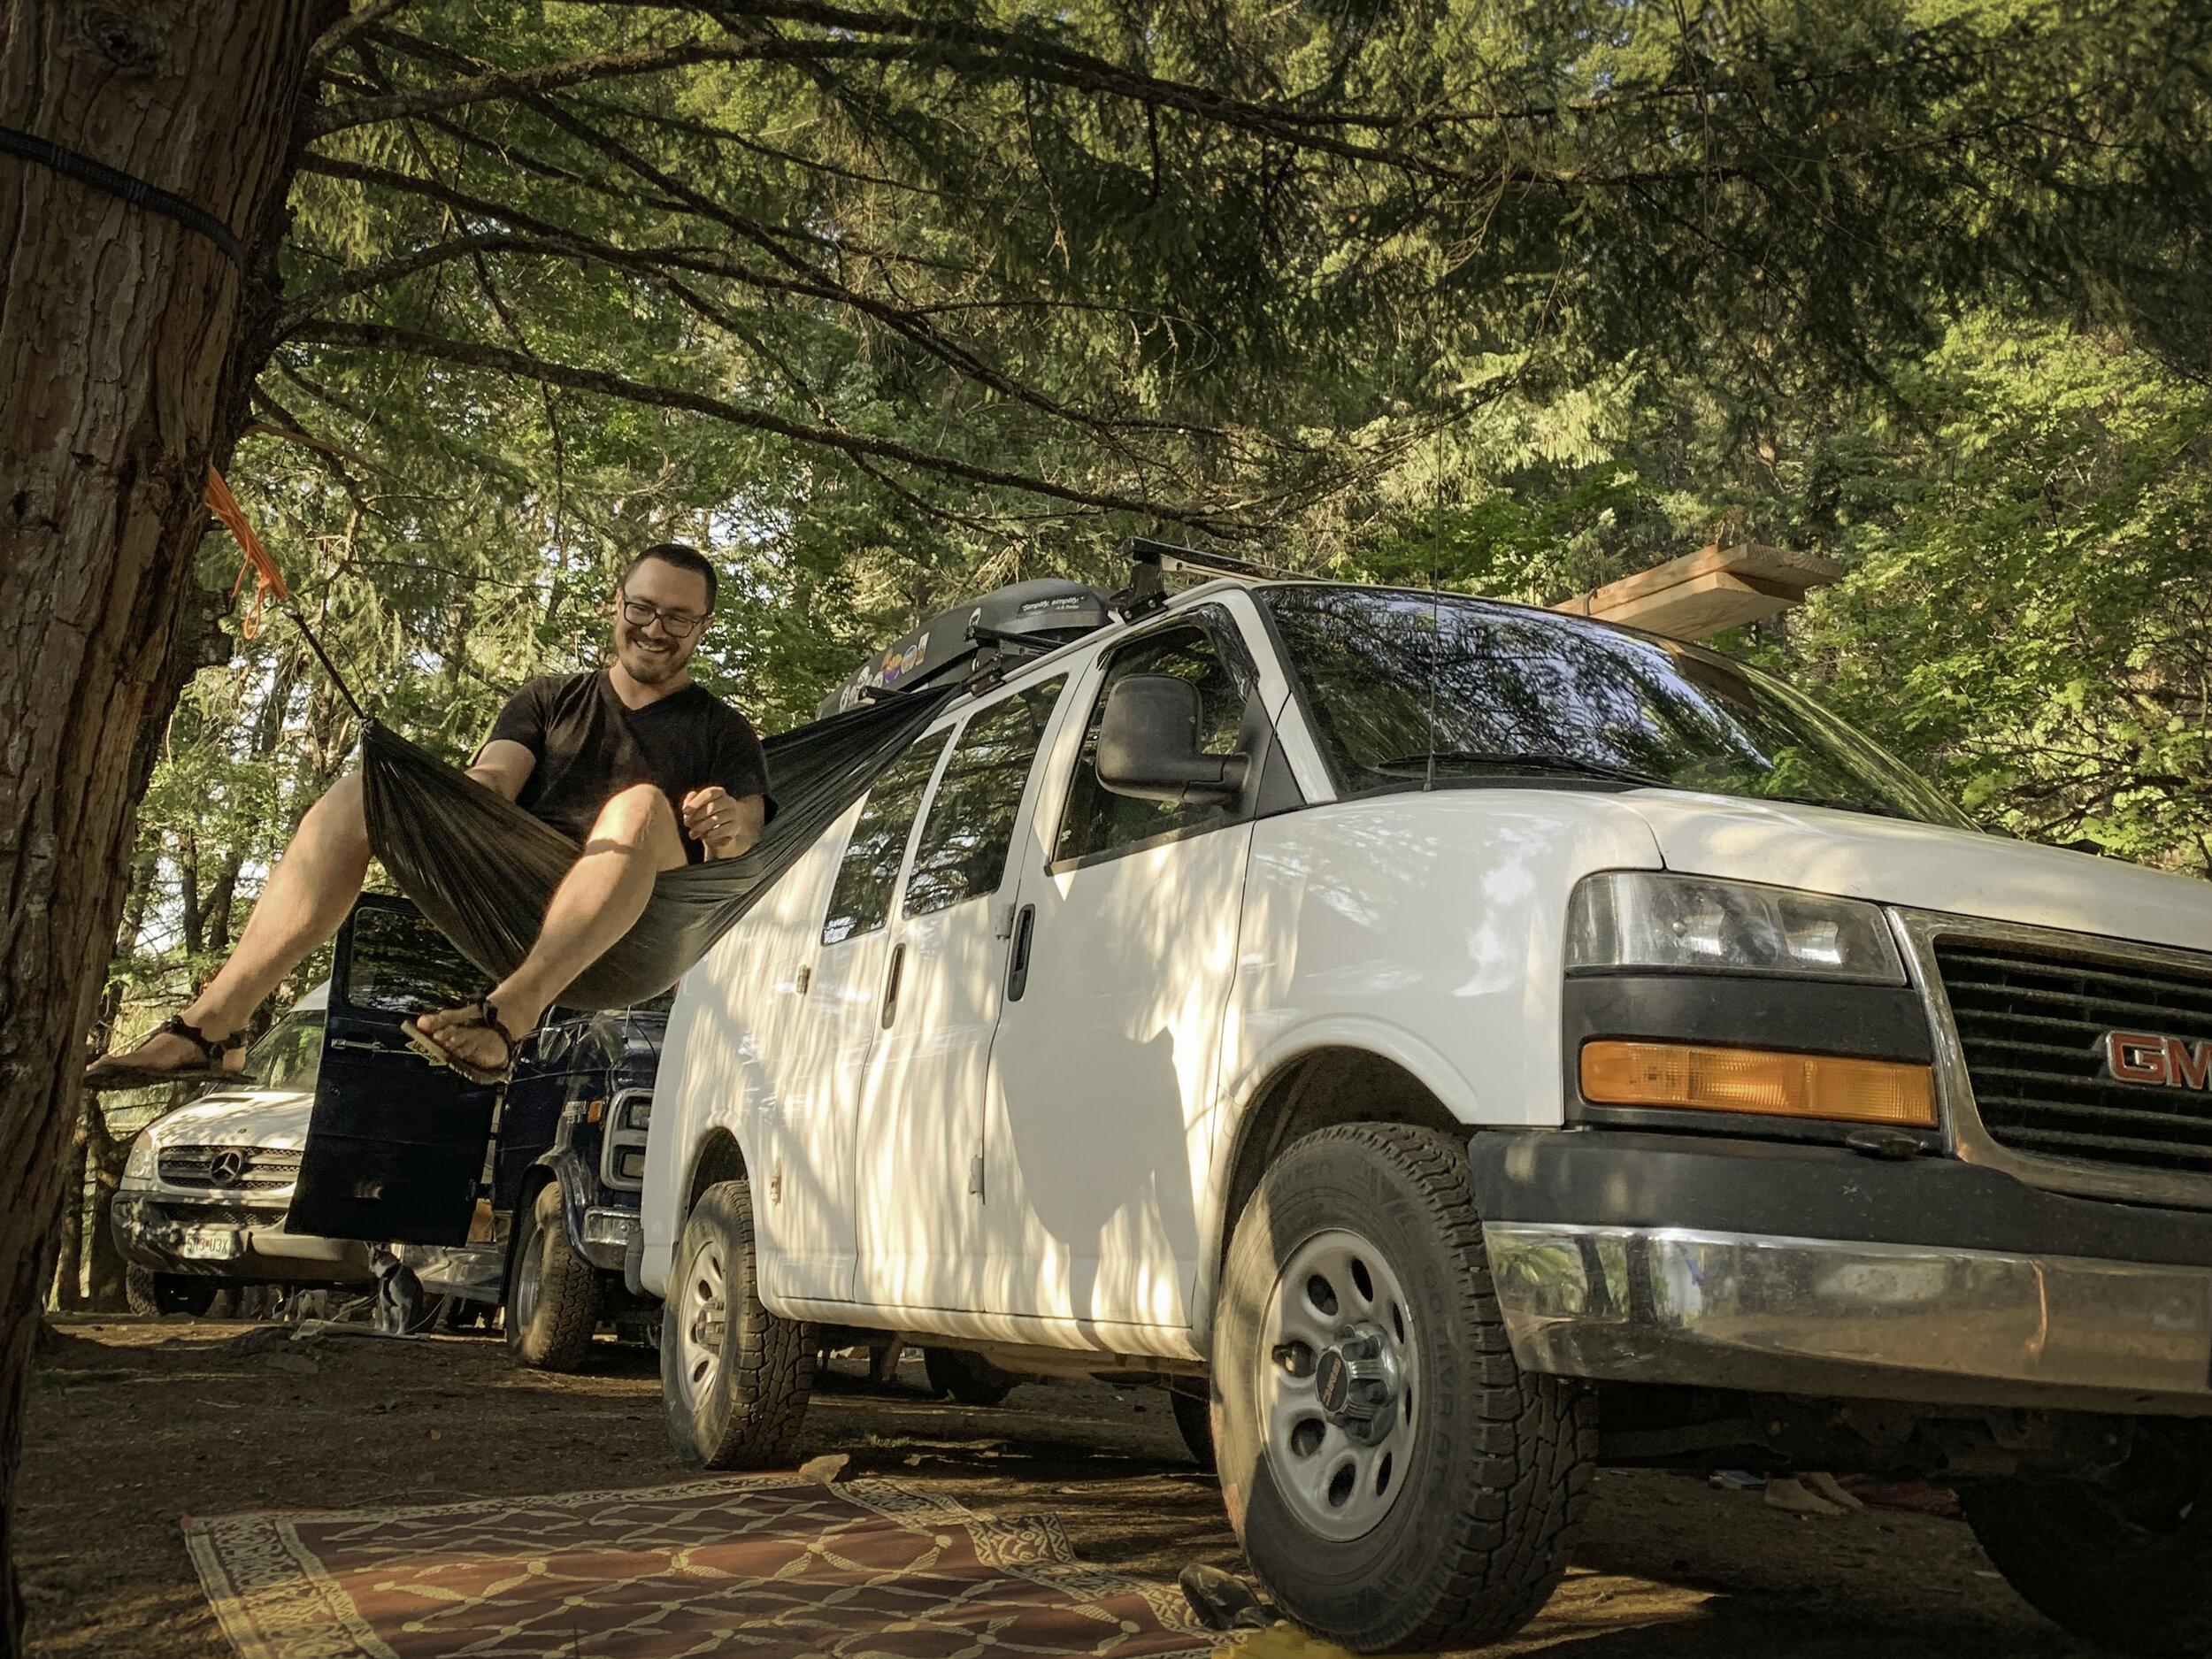 Chris relaxing in a sweet Van/Hammock set up Photo by:  @Kelsidailey